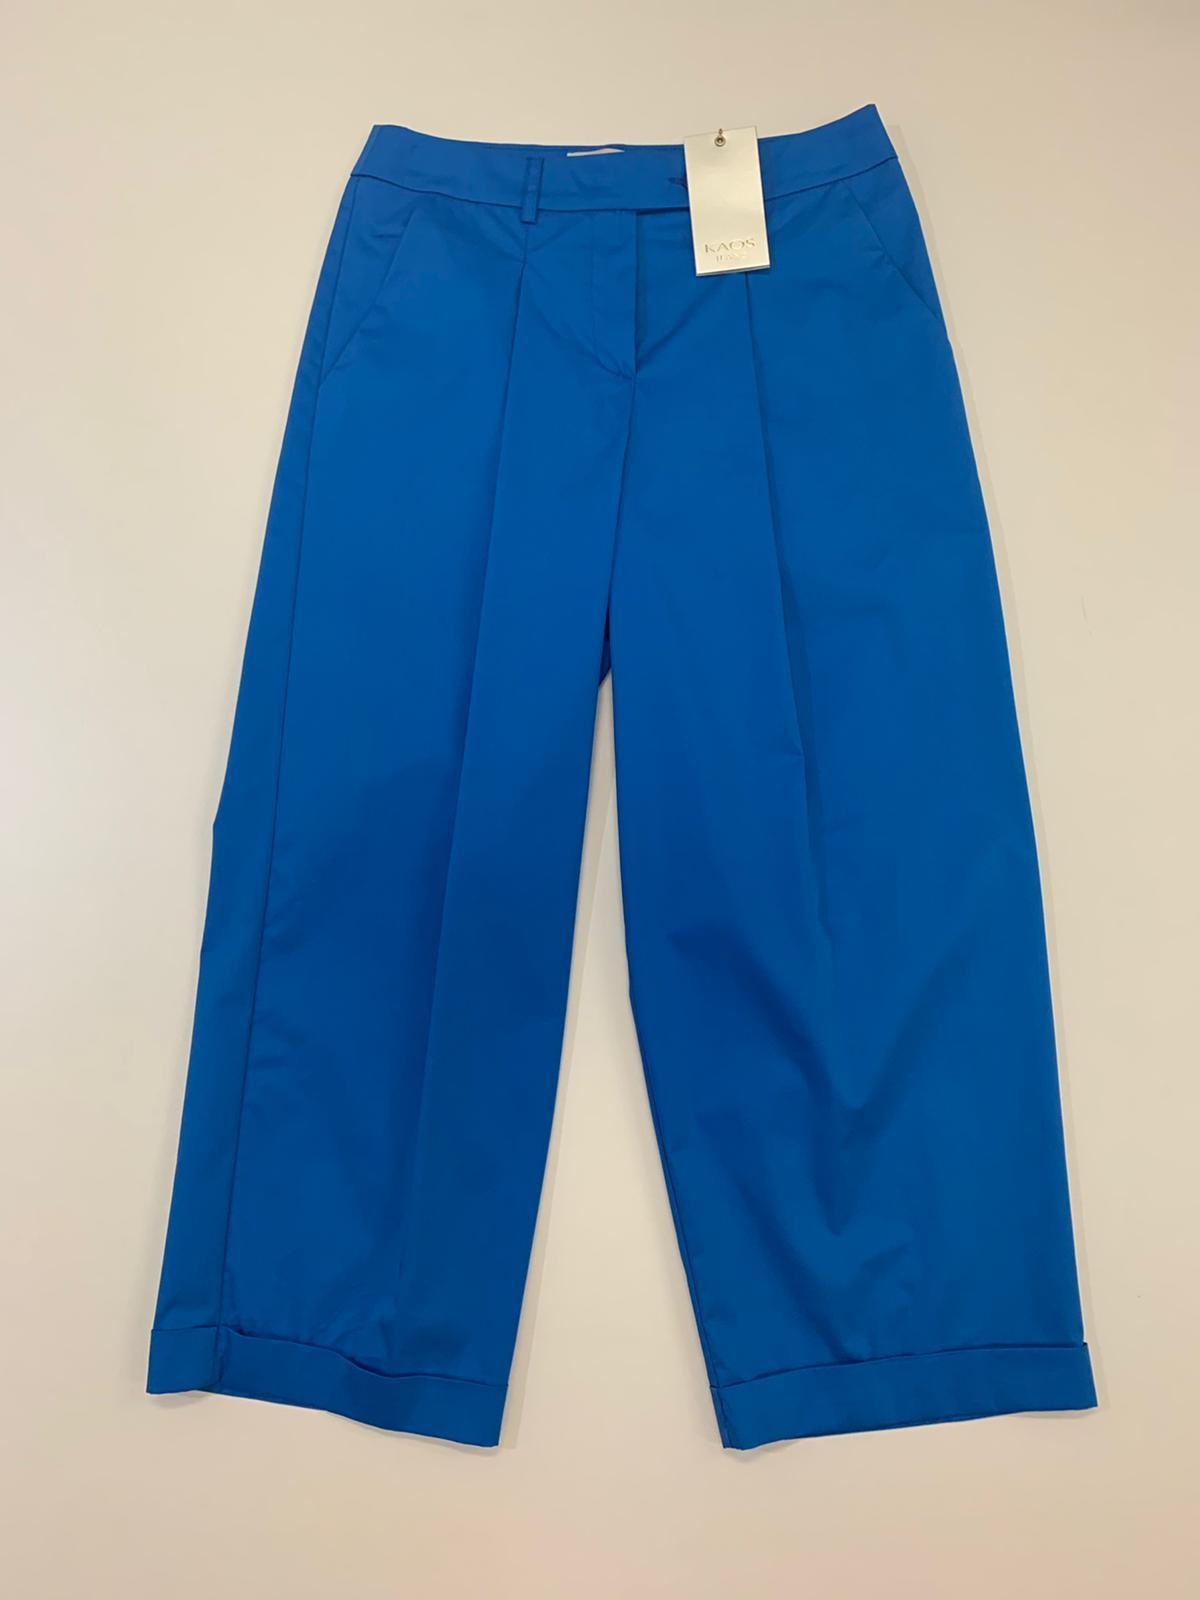 Pantalone Kaos Jeans Croppe Oceano